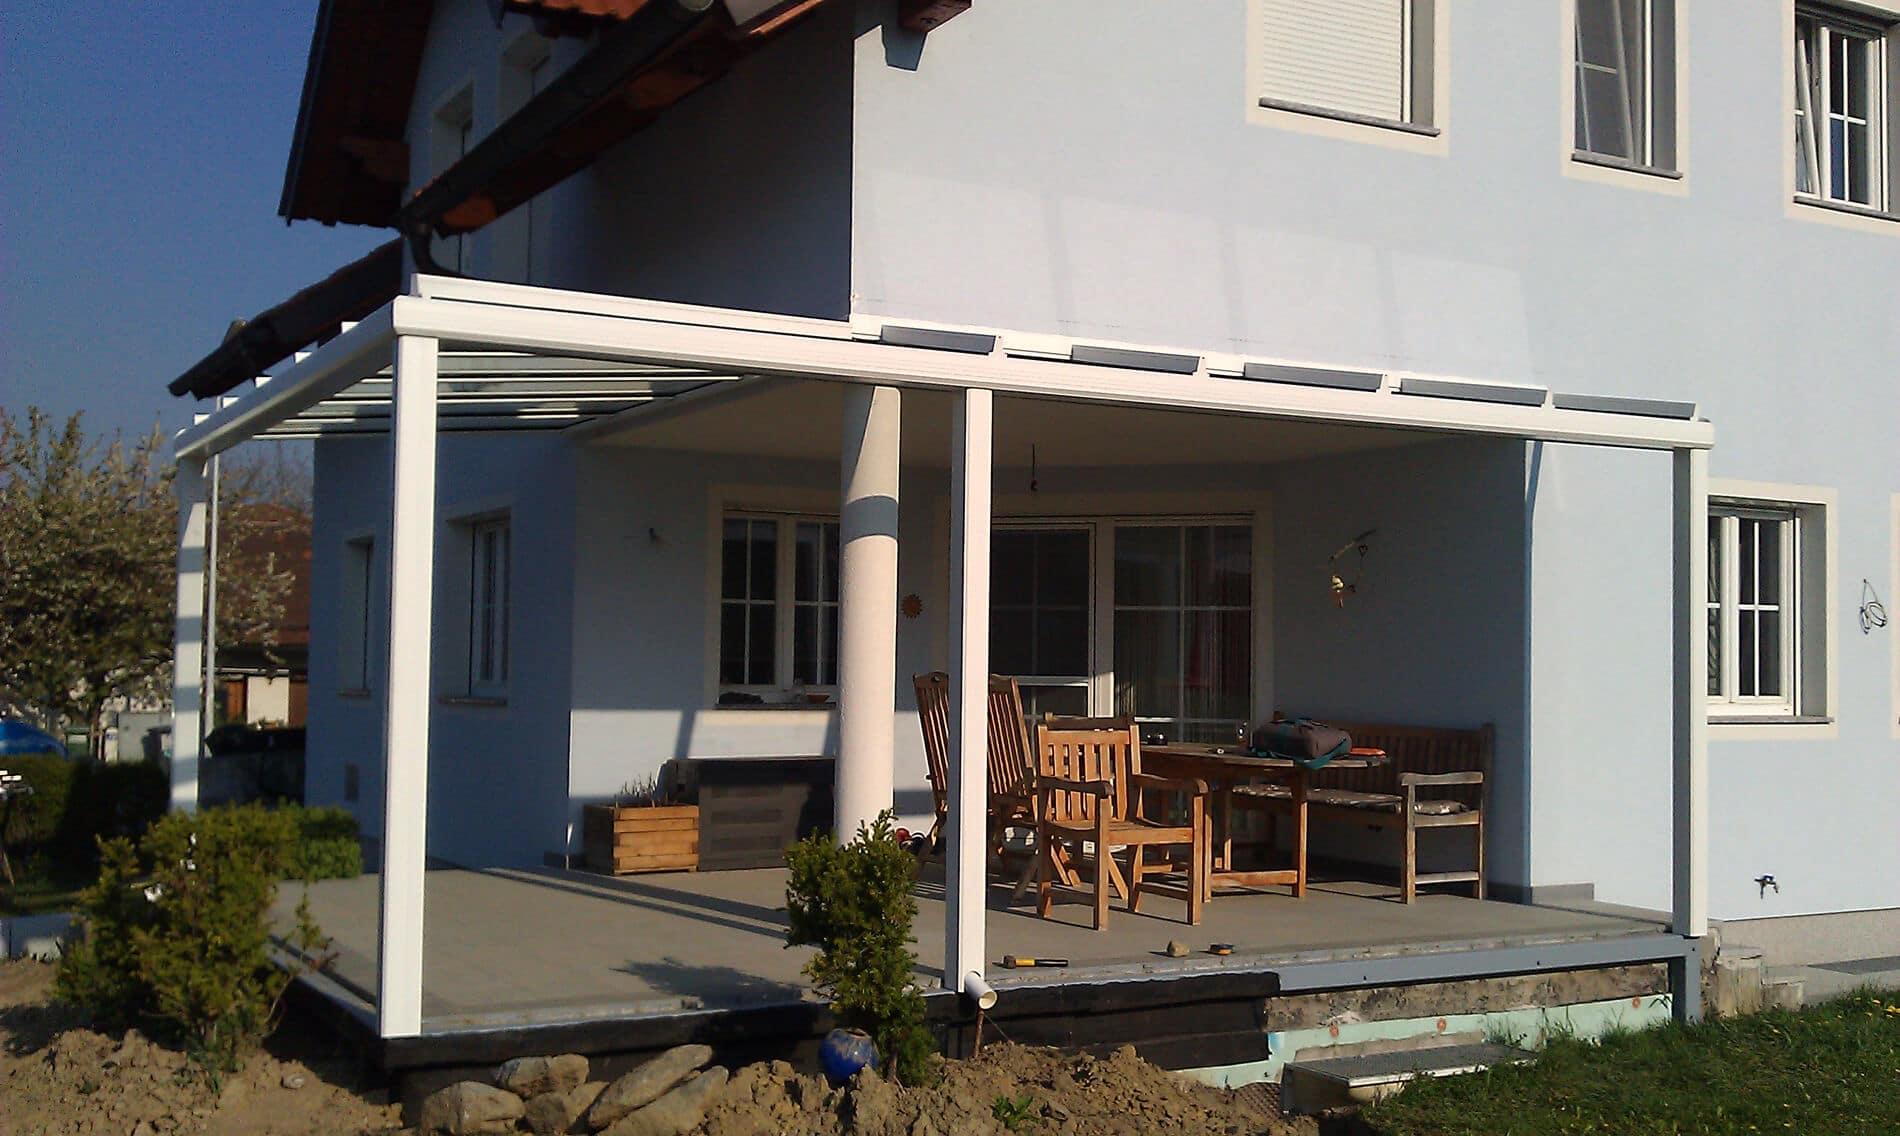 Outdoor Küche Gaskochfeld : Outdoor küchen modell iron privat collection